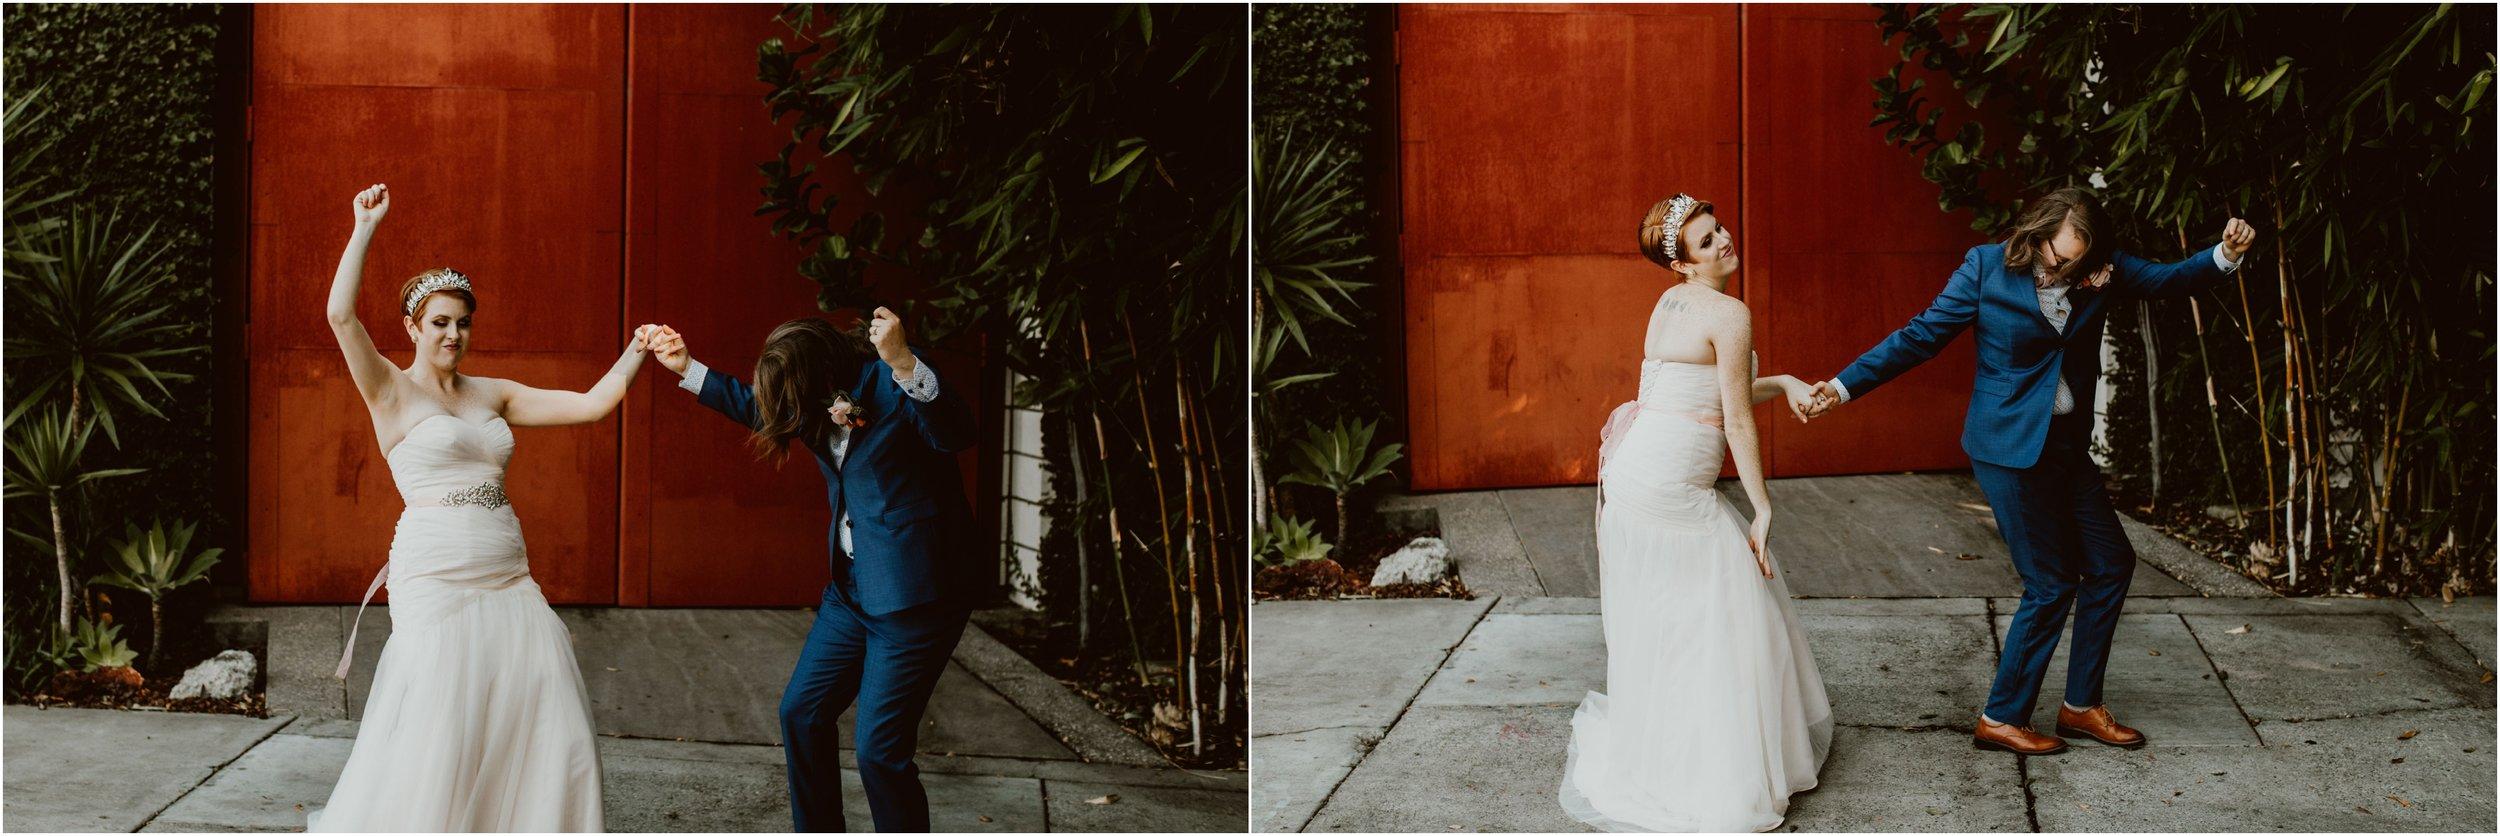 Smogshoppe-Wedding-S+C-Diana-Lake-Photography-670.jpg